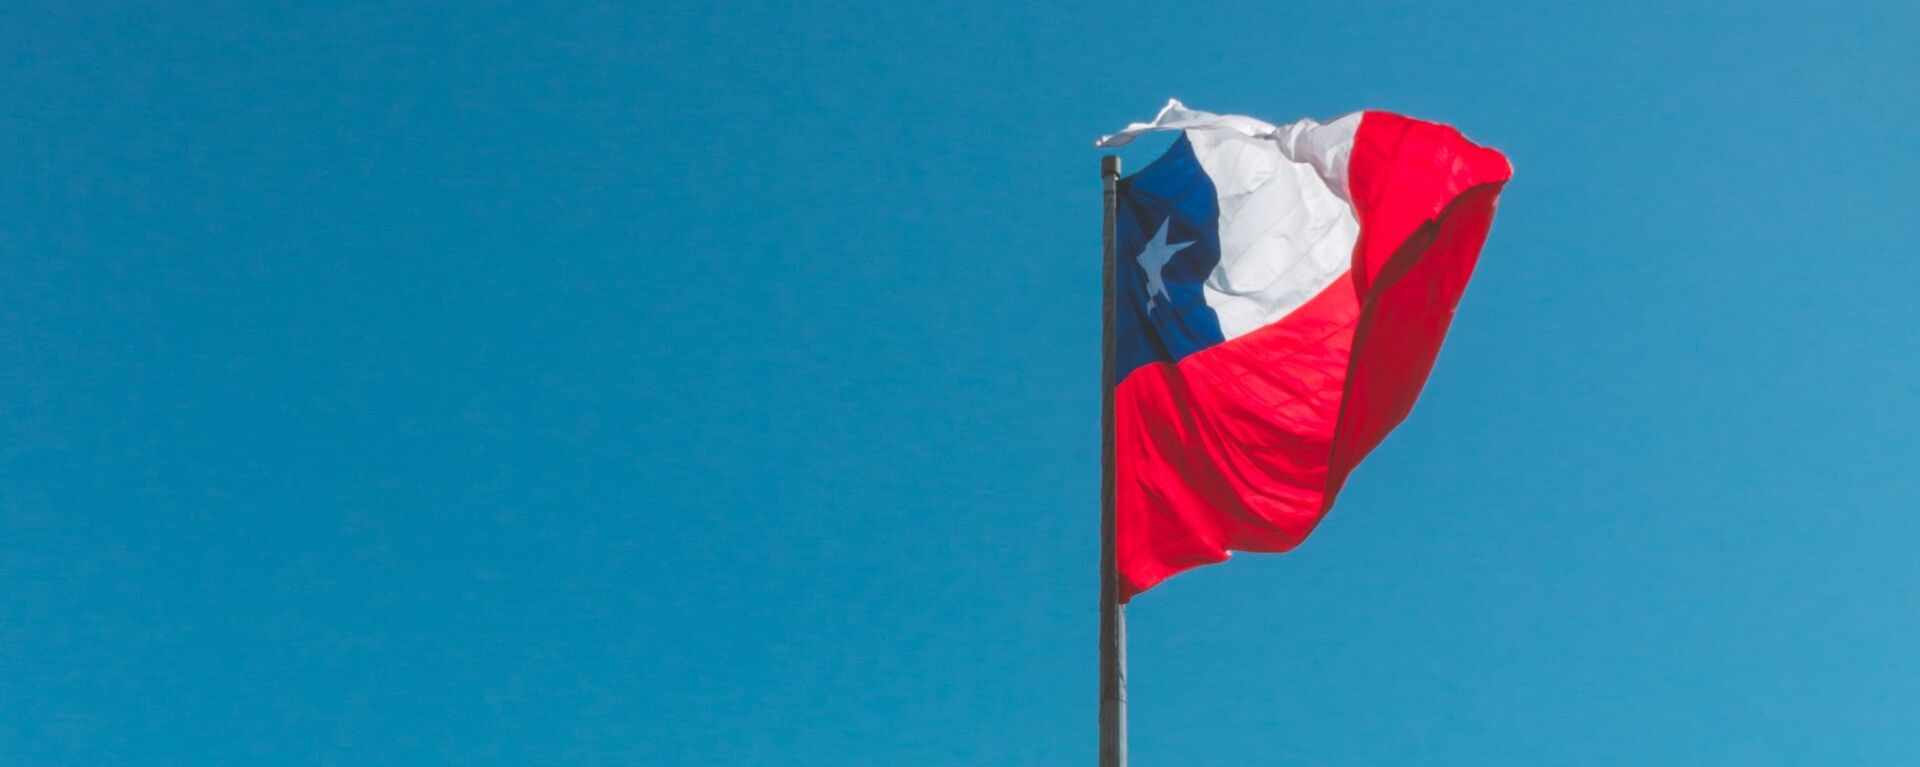 La bandera de Chile - Sputnik Mundo, 1920, 13.11.2020